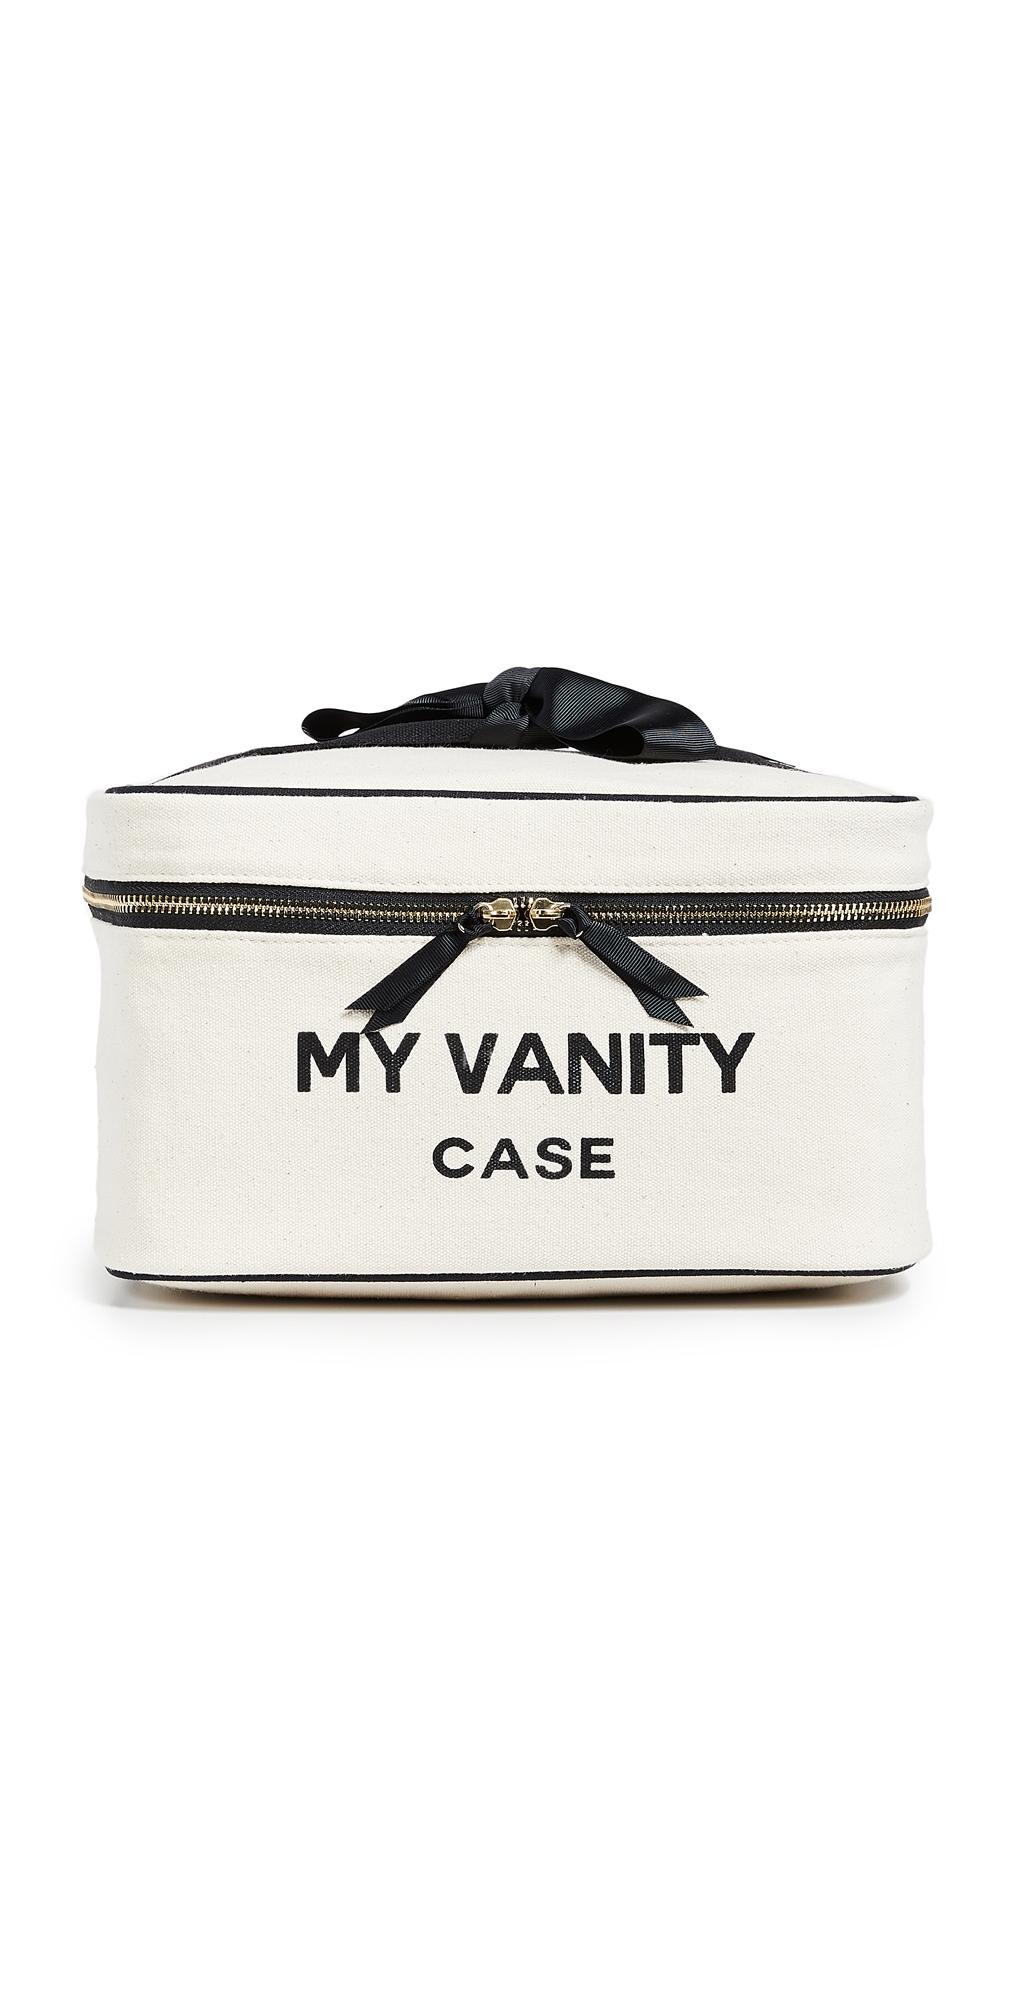 My Vanity Travel Case